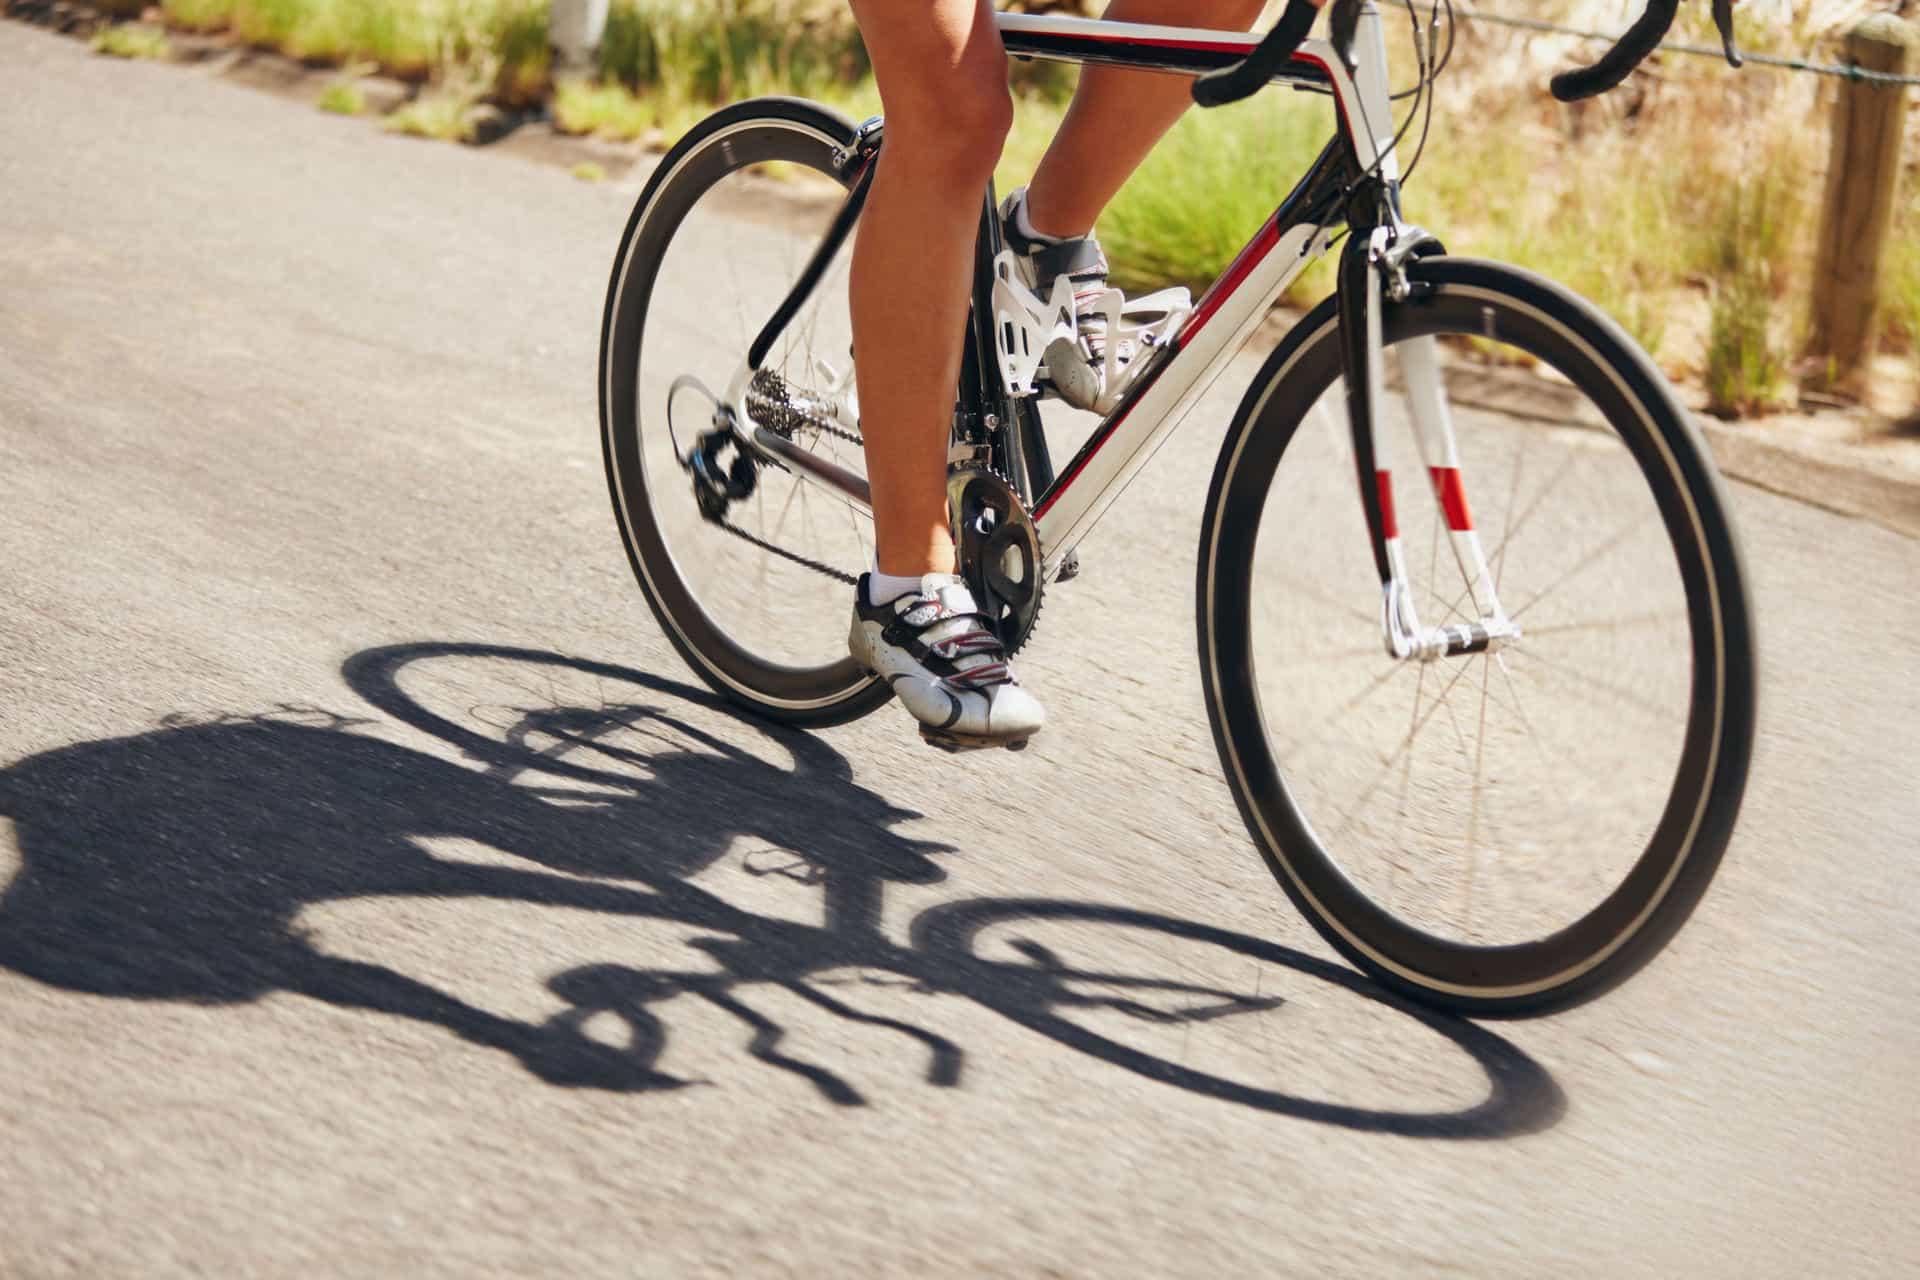 mijn hobby is wielrennen